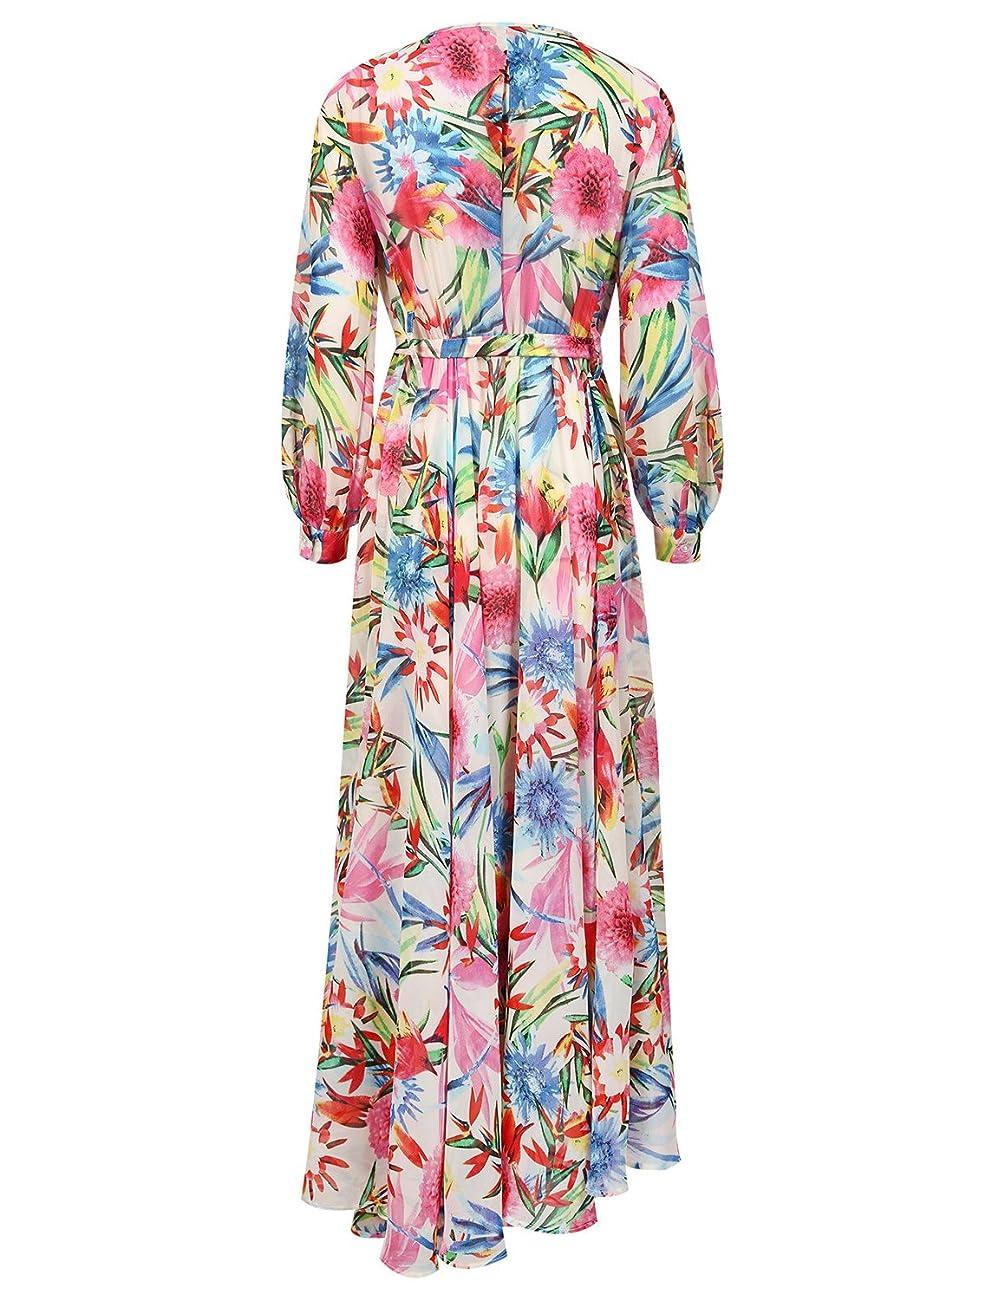 Haoyihui Vintage Style Chiffon V Neck Puff Pleated Wrap Long Maxi Full-Skirted Dress 2